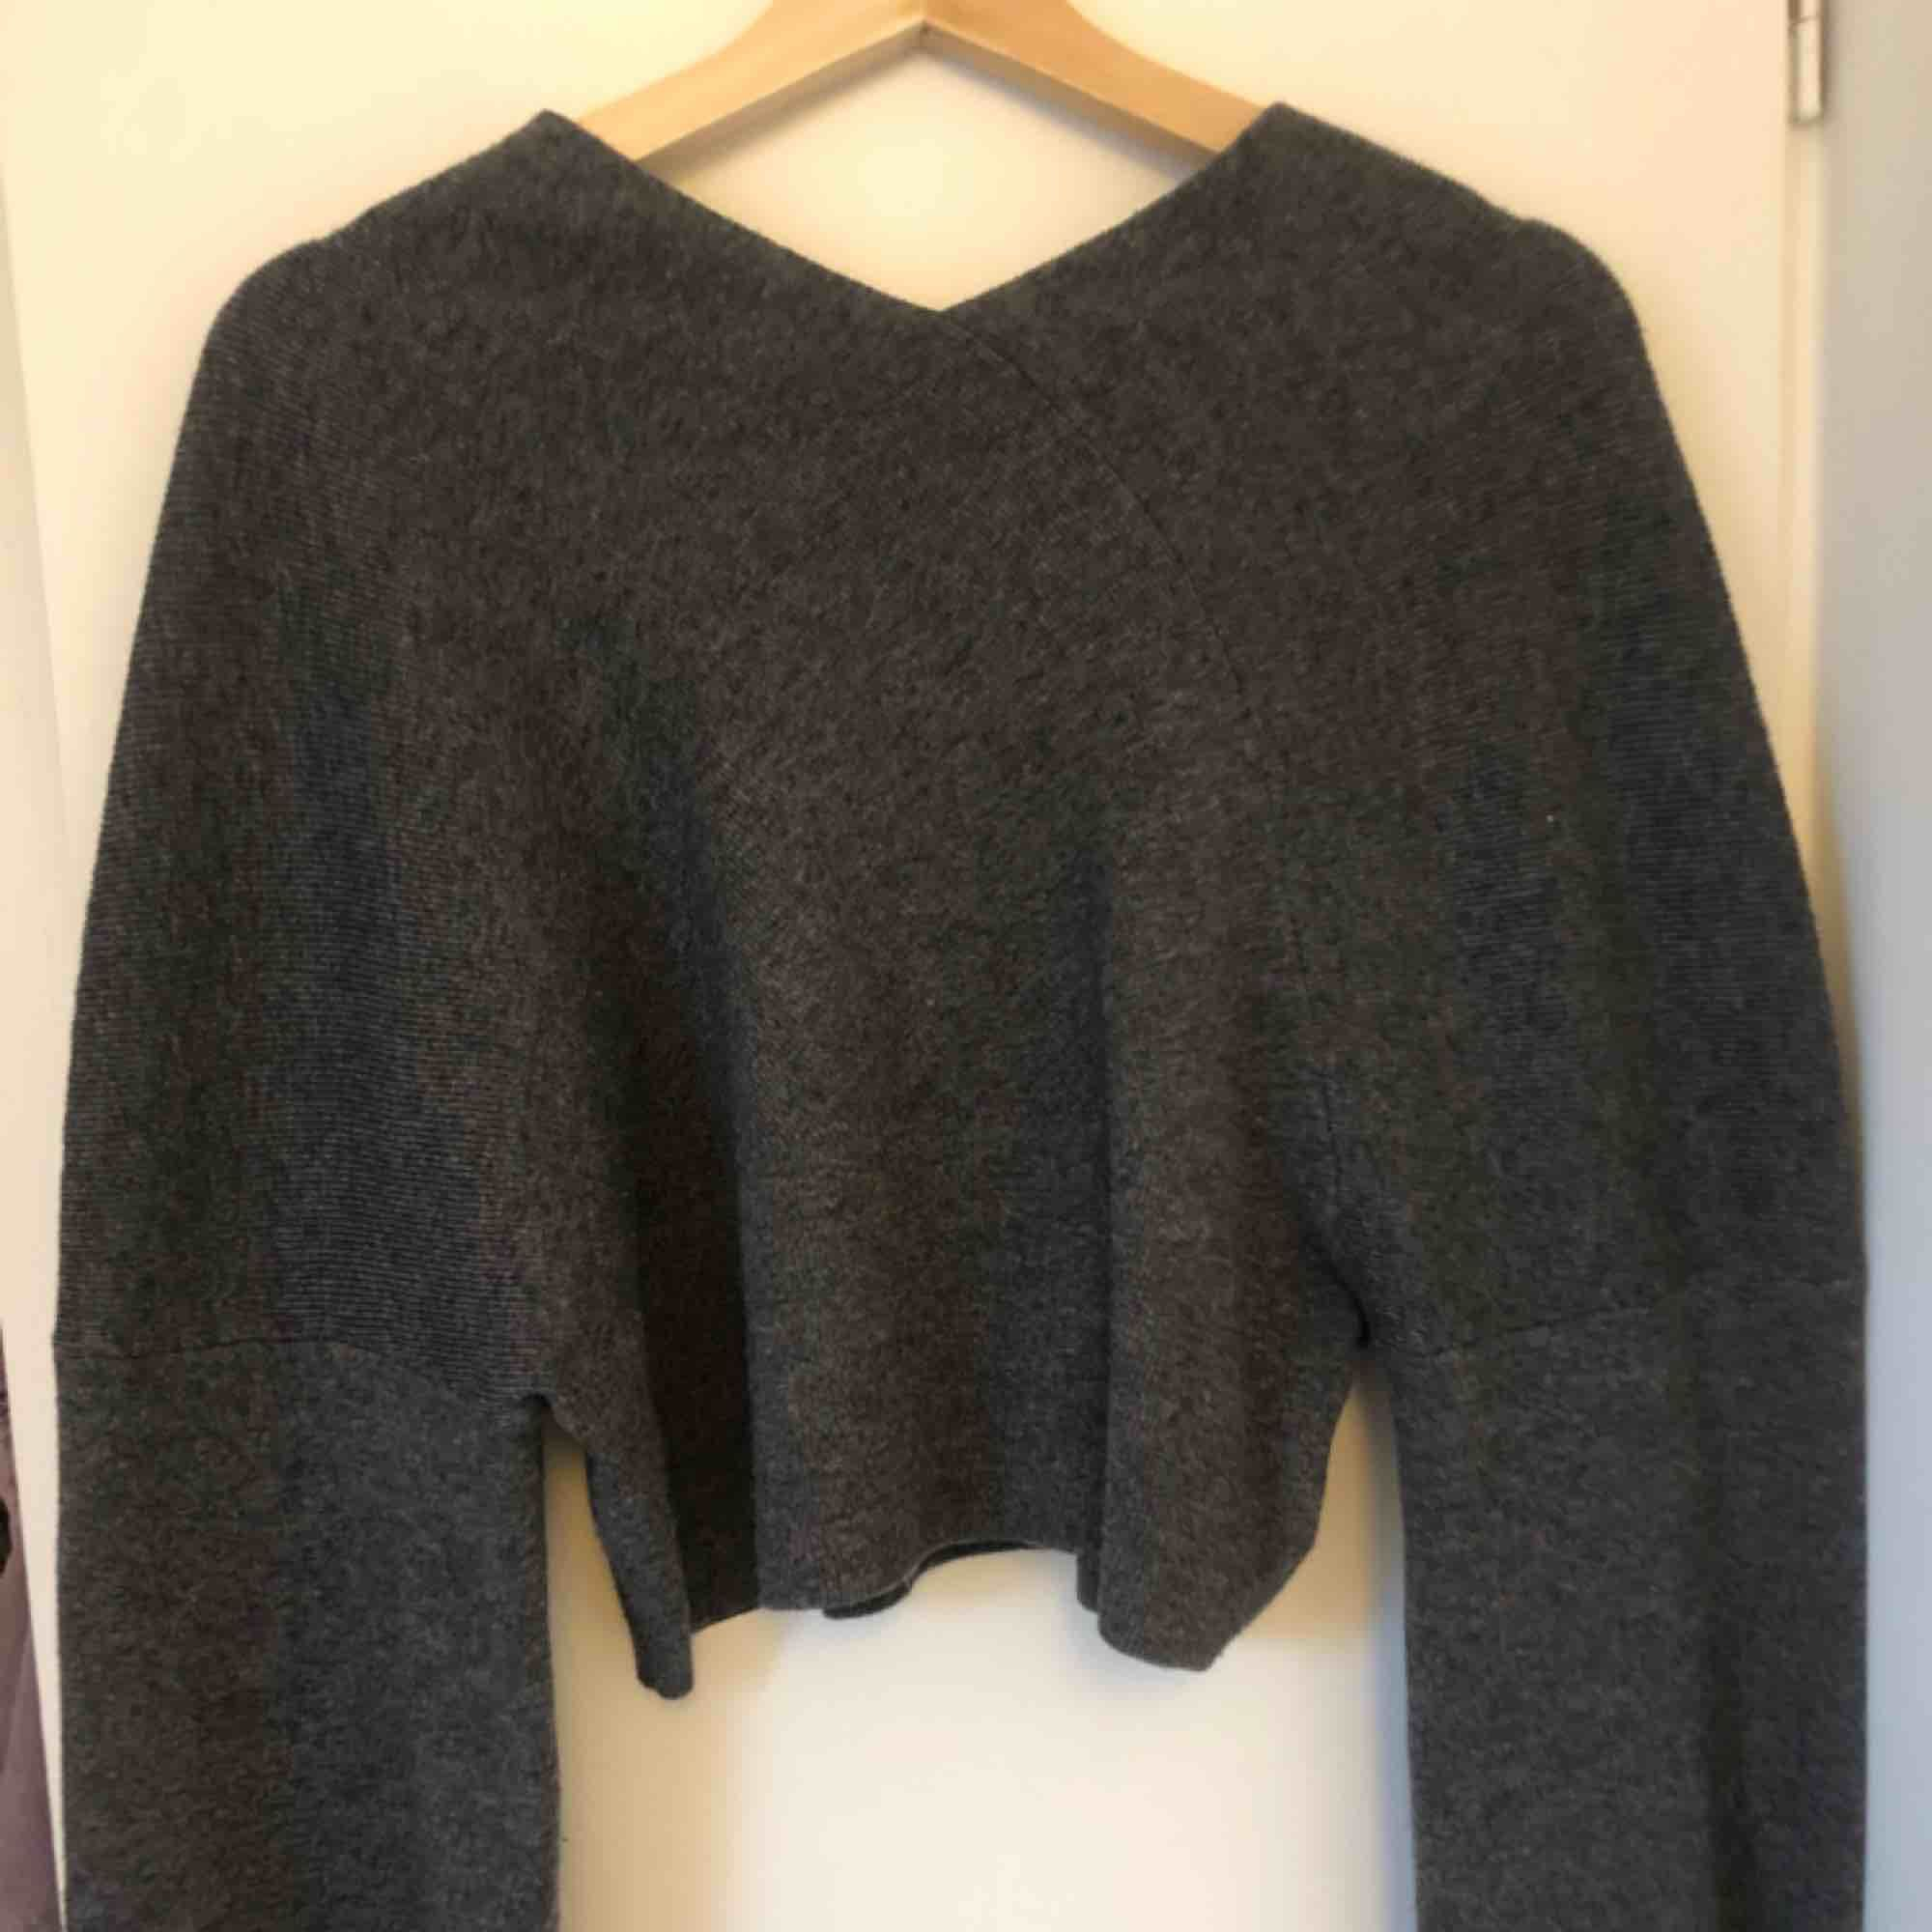 Fin grå croppad stickad tröja från weekday. Stickat.